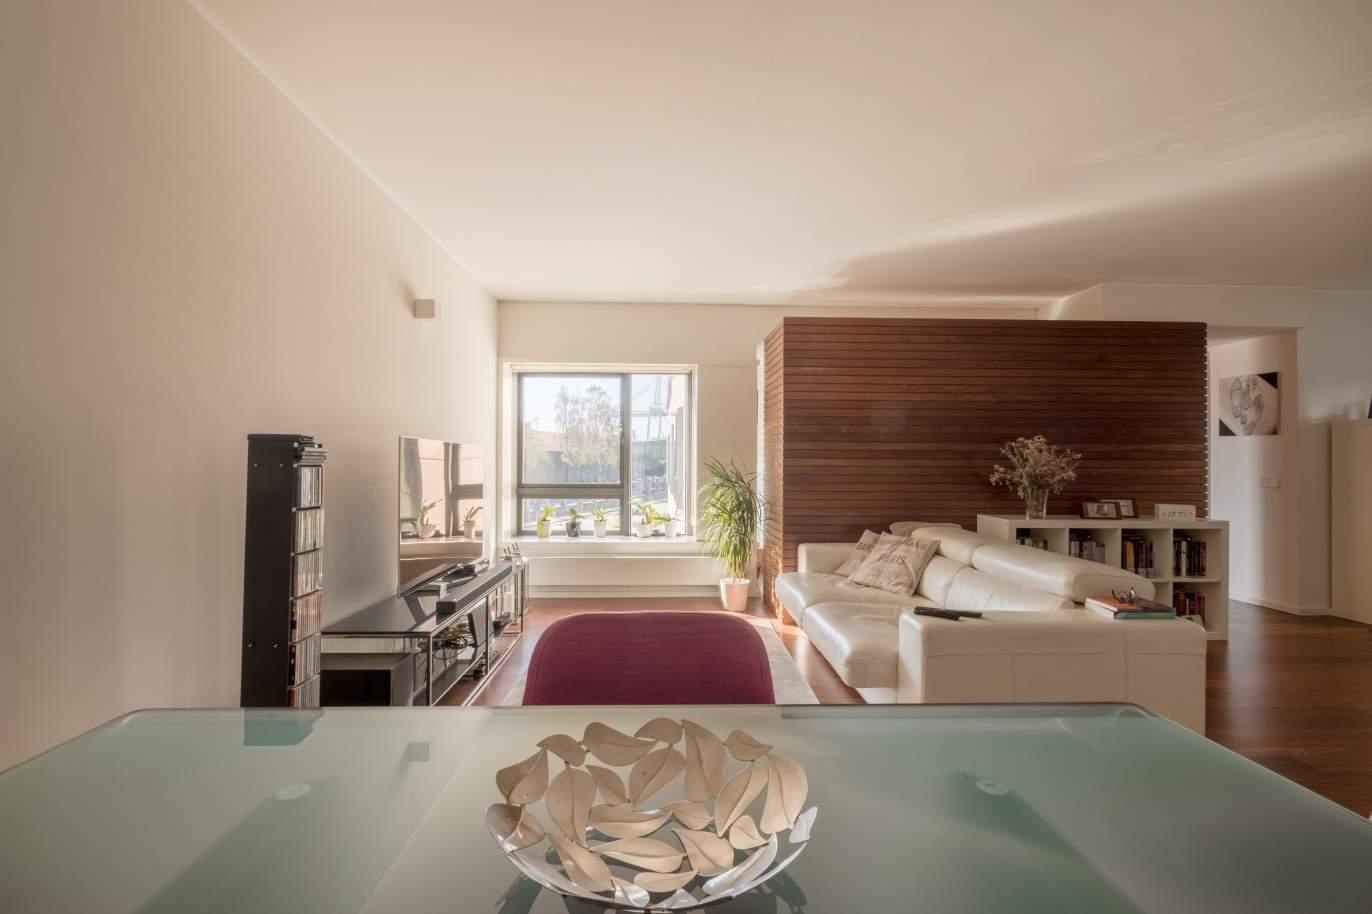 venta-de-apartamento-de-lujo-en-leca-da-palmeira-portugal